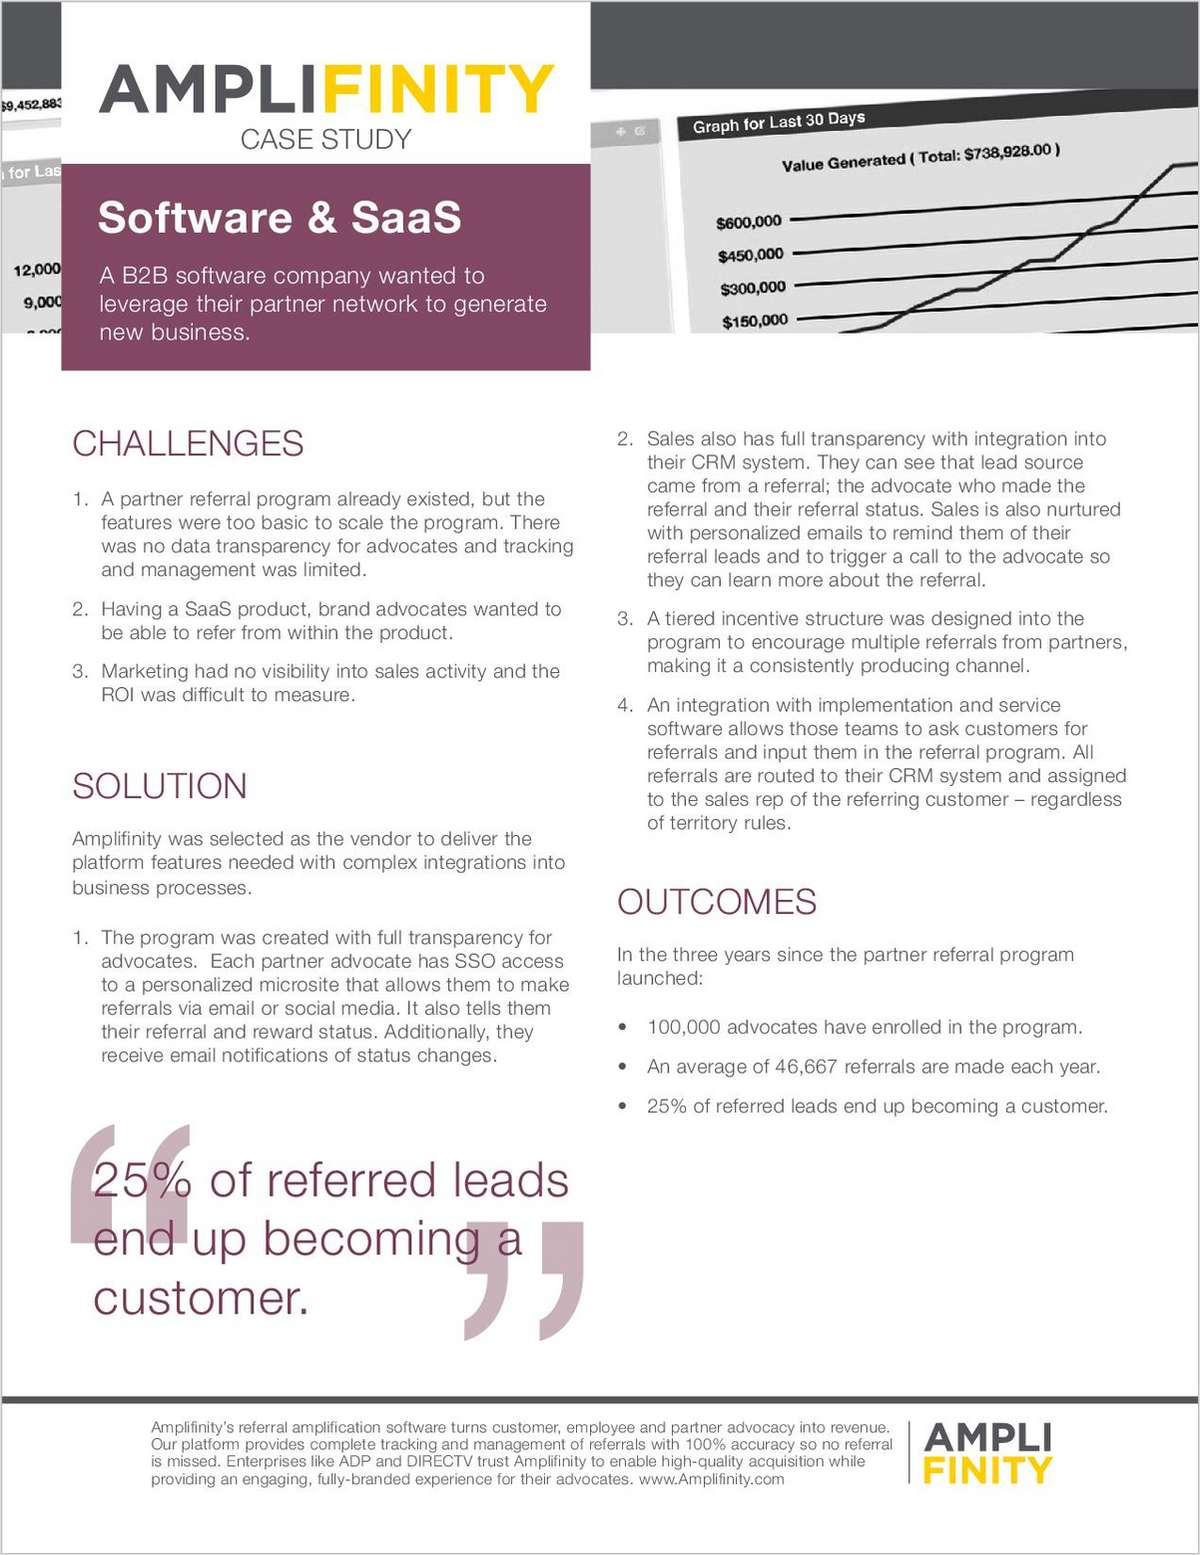 SaaS Partner Referral Program - Case Study